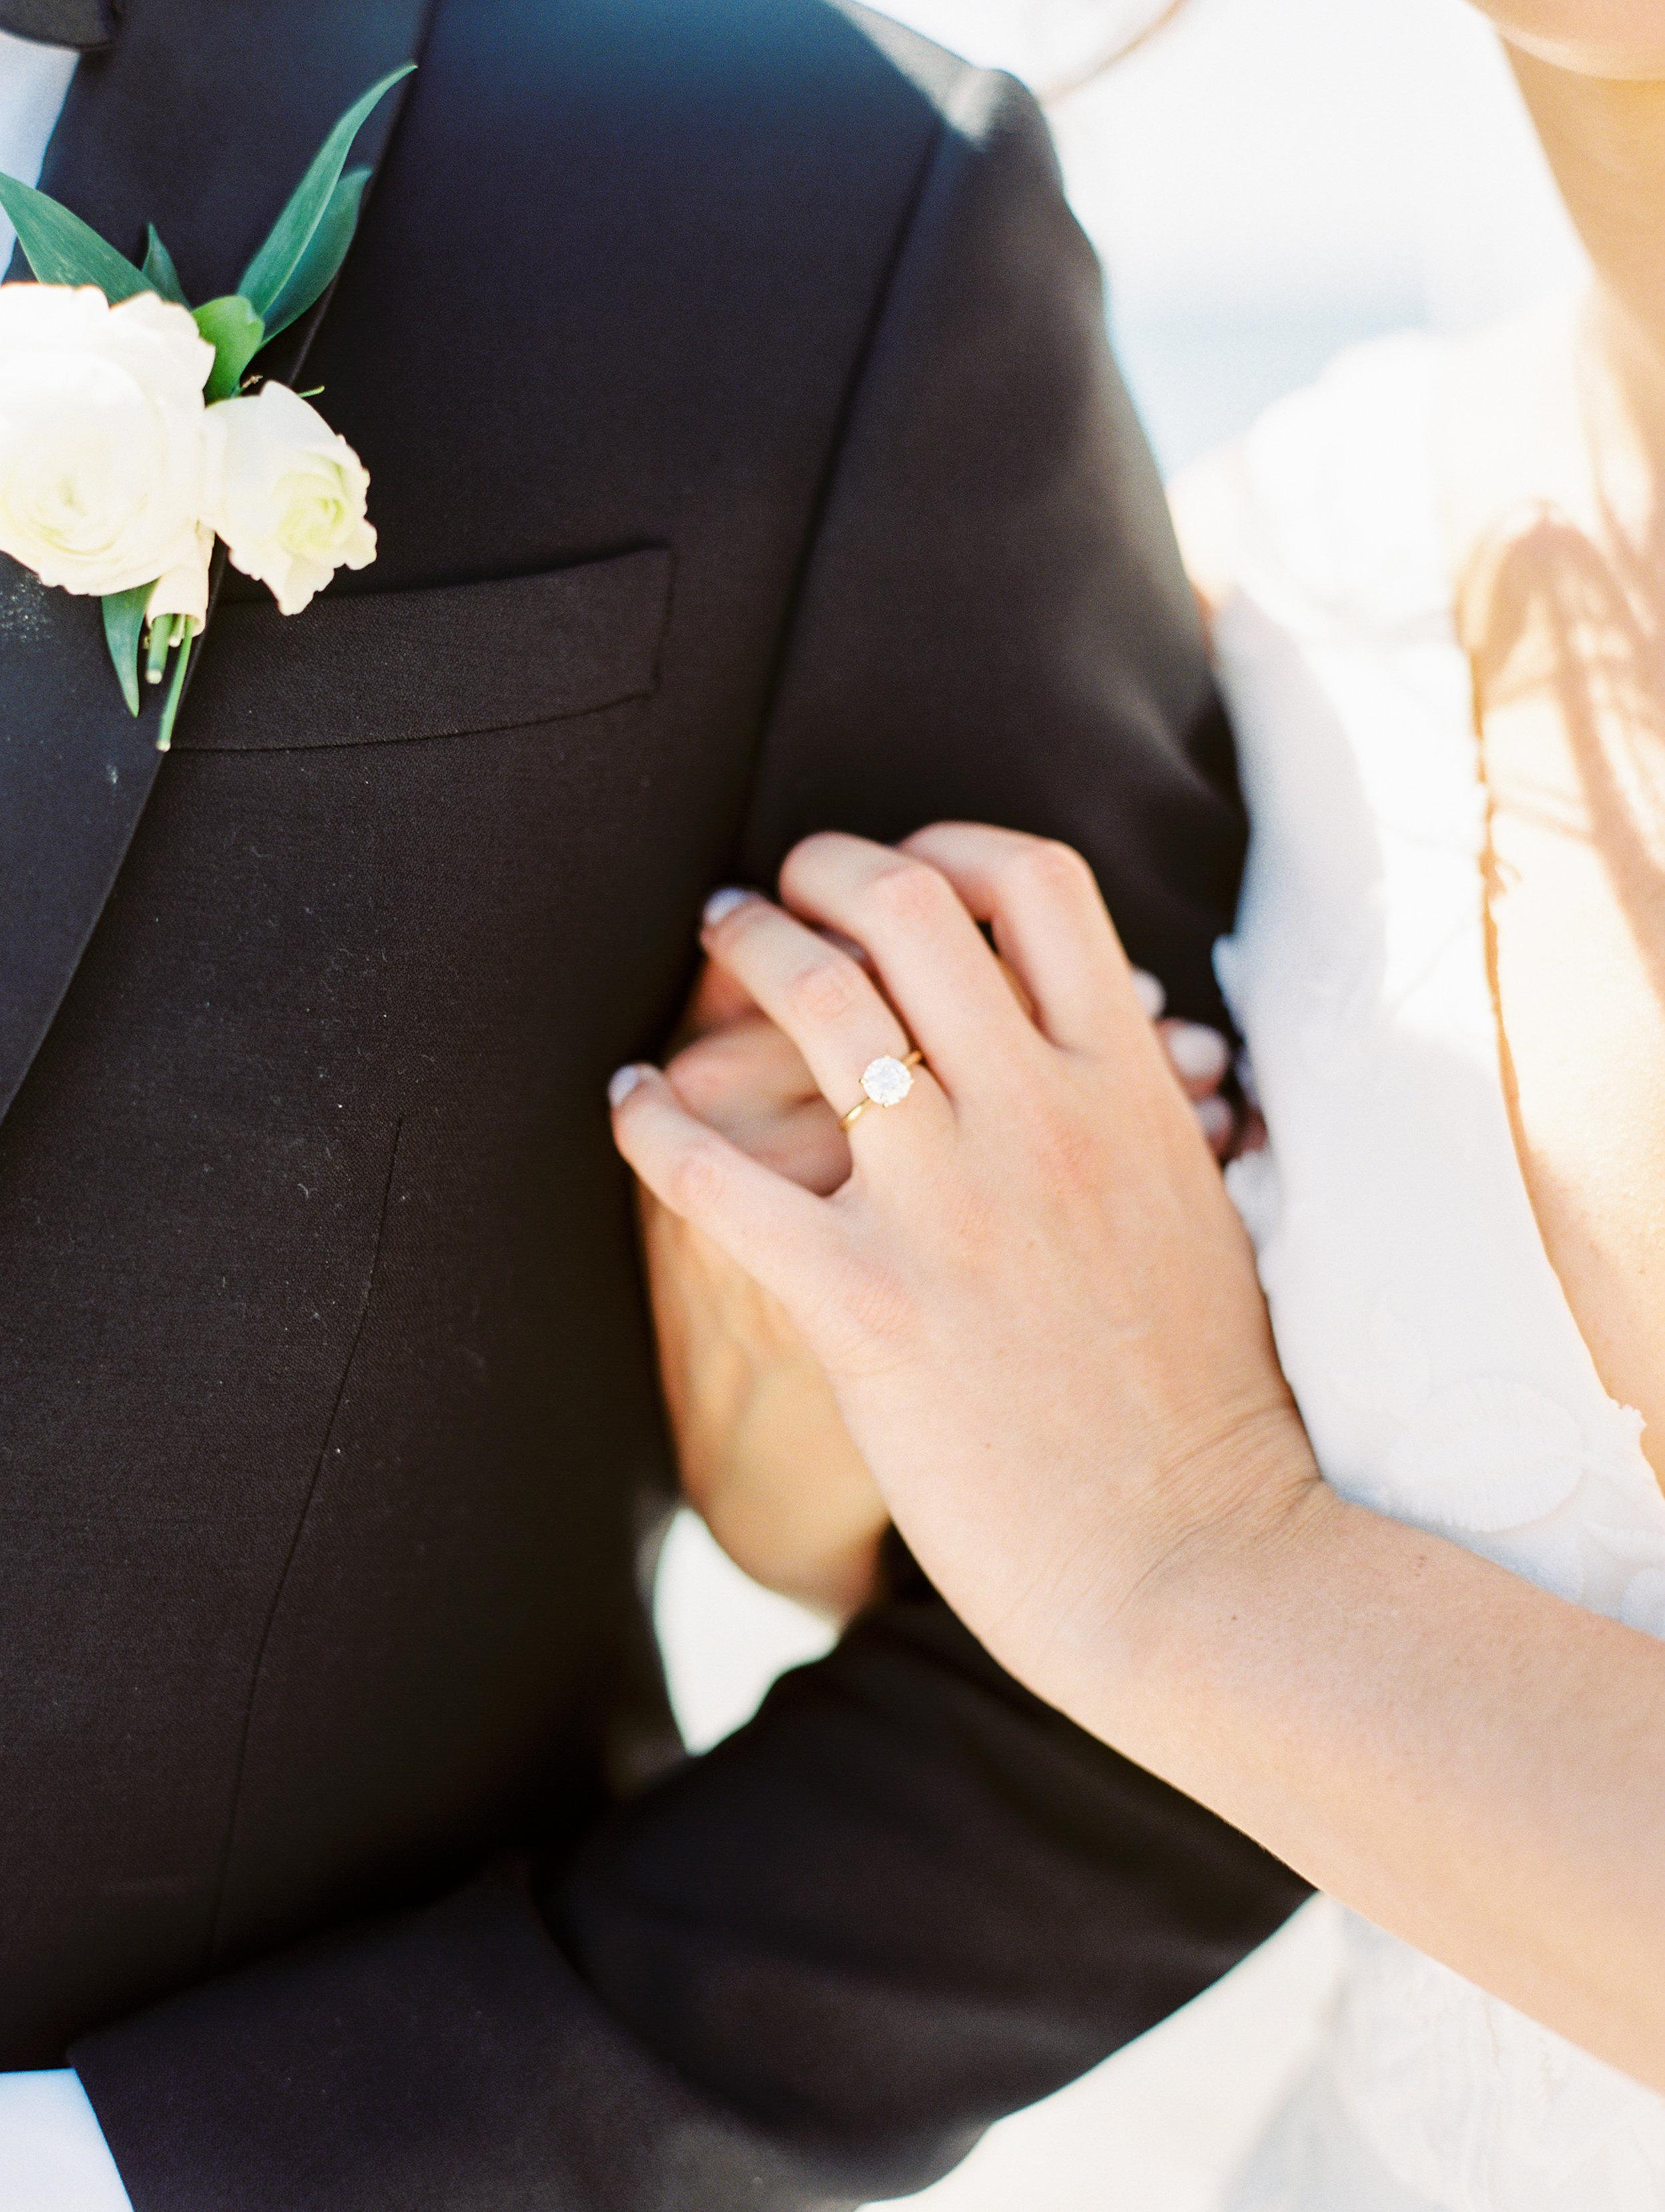 DeGuilio+Wedding+Bridal+Partyf-102.jpg